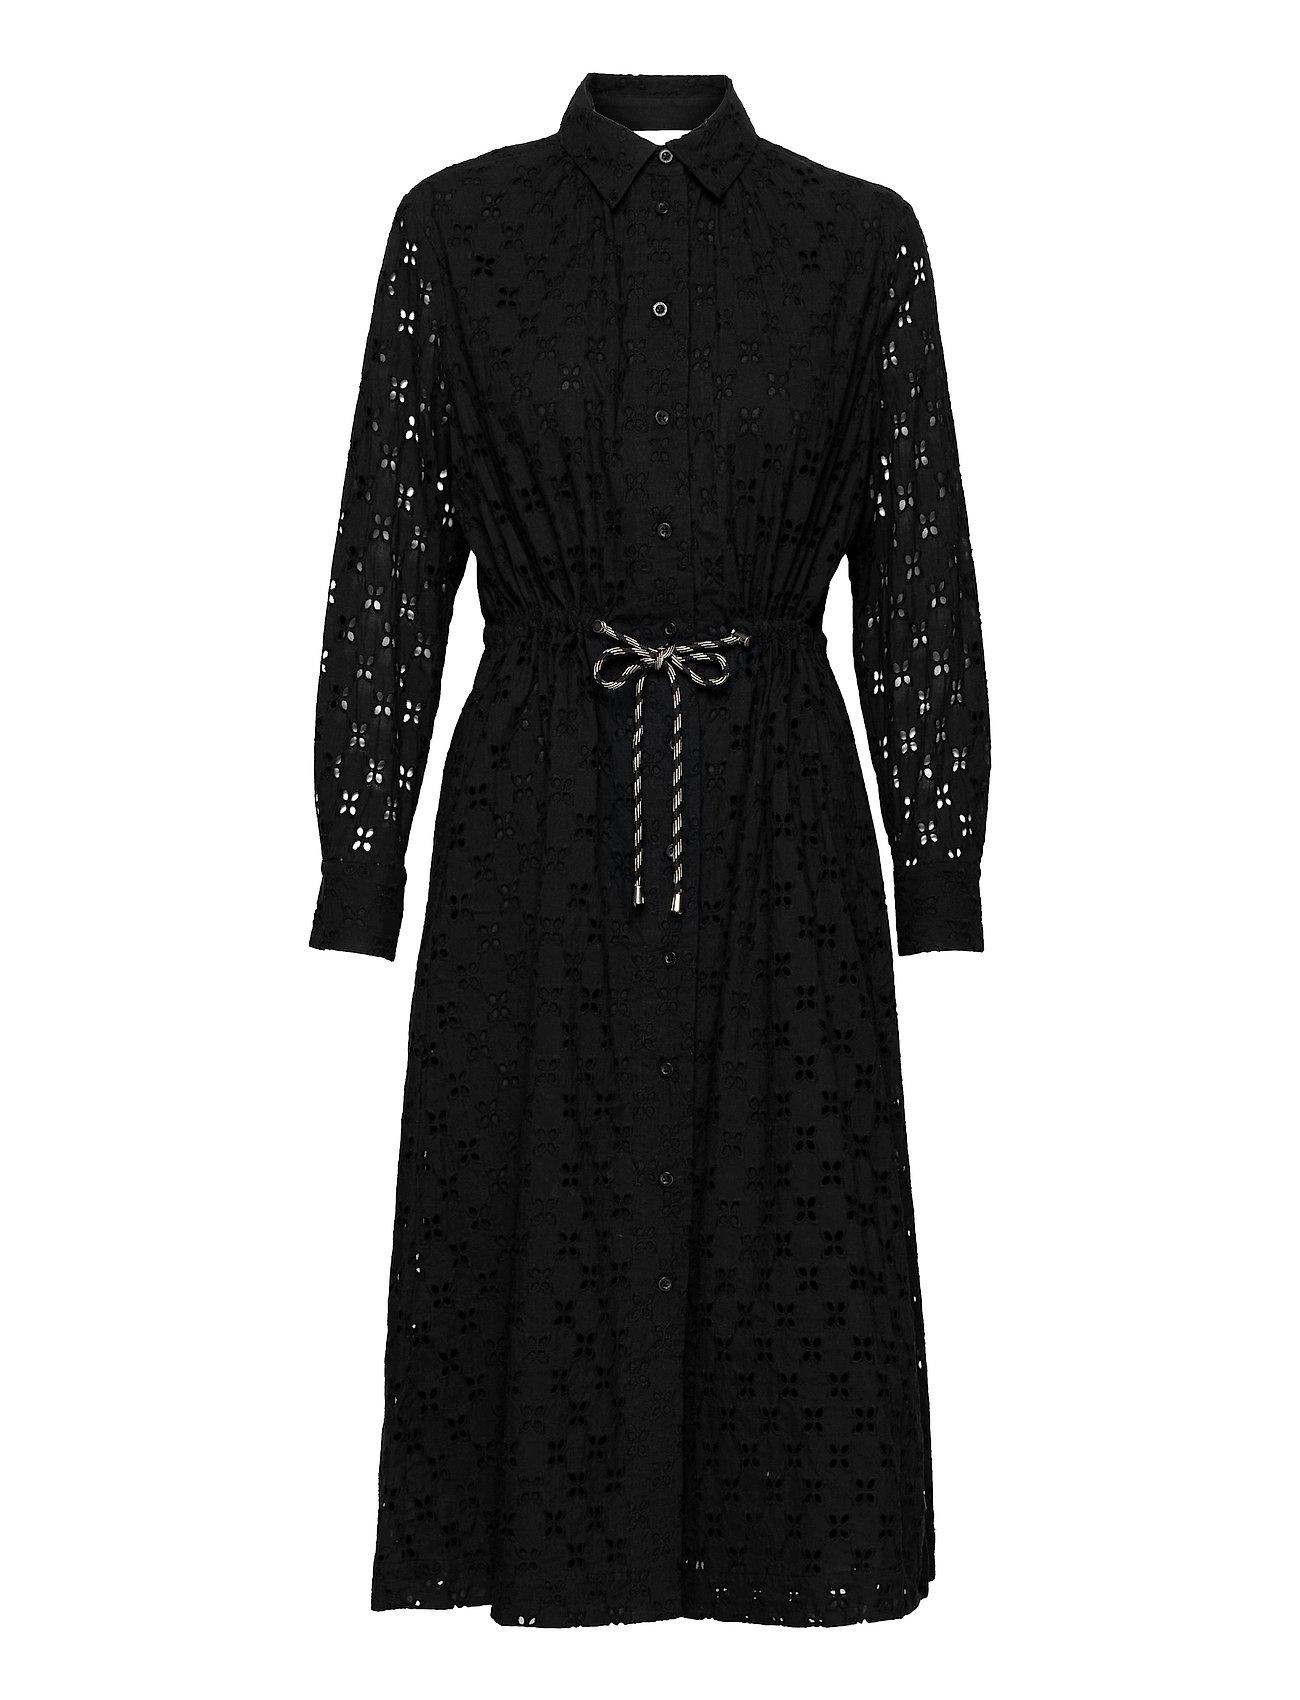 Thelma Dress Dresses Cocktail Dresses Sort Second Female